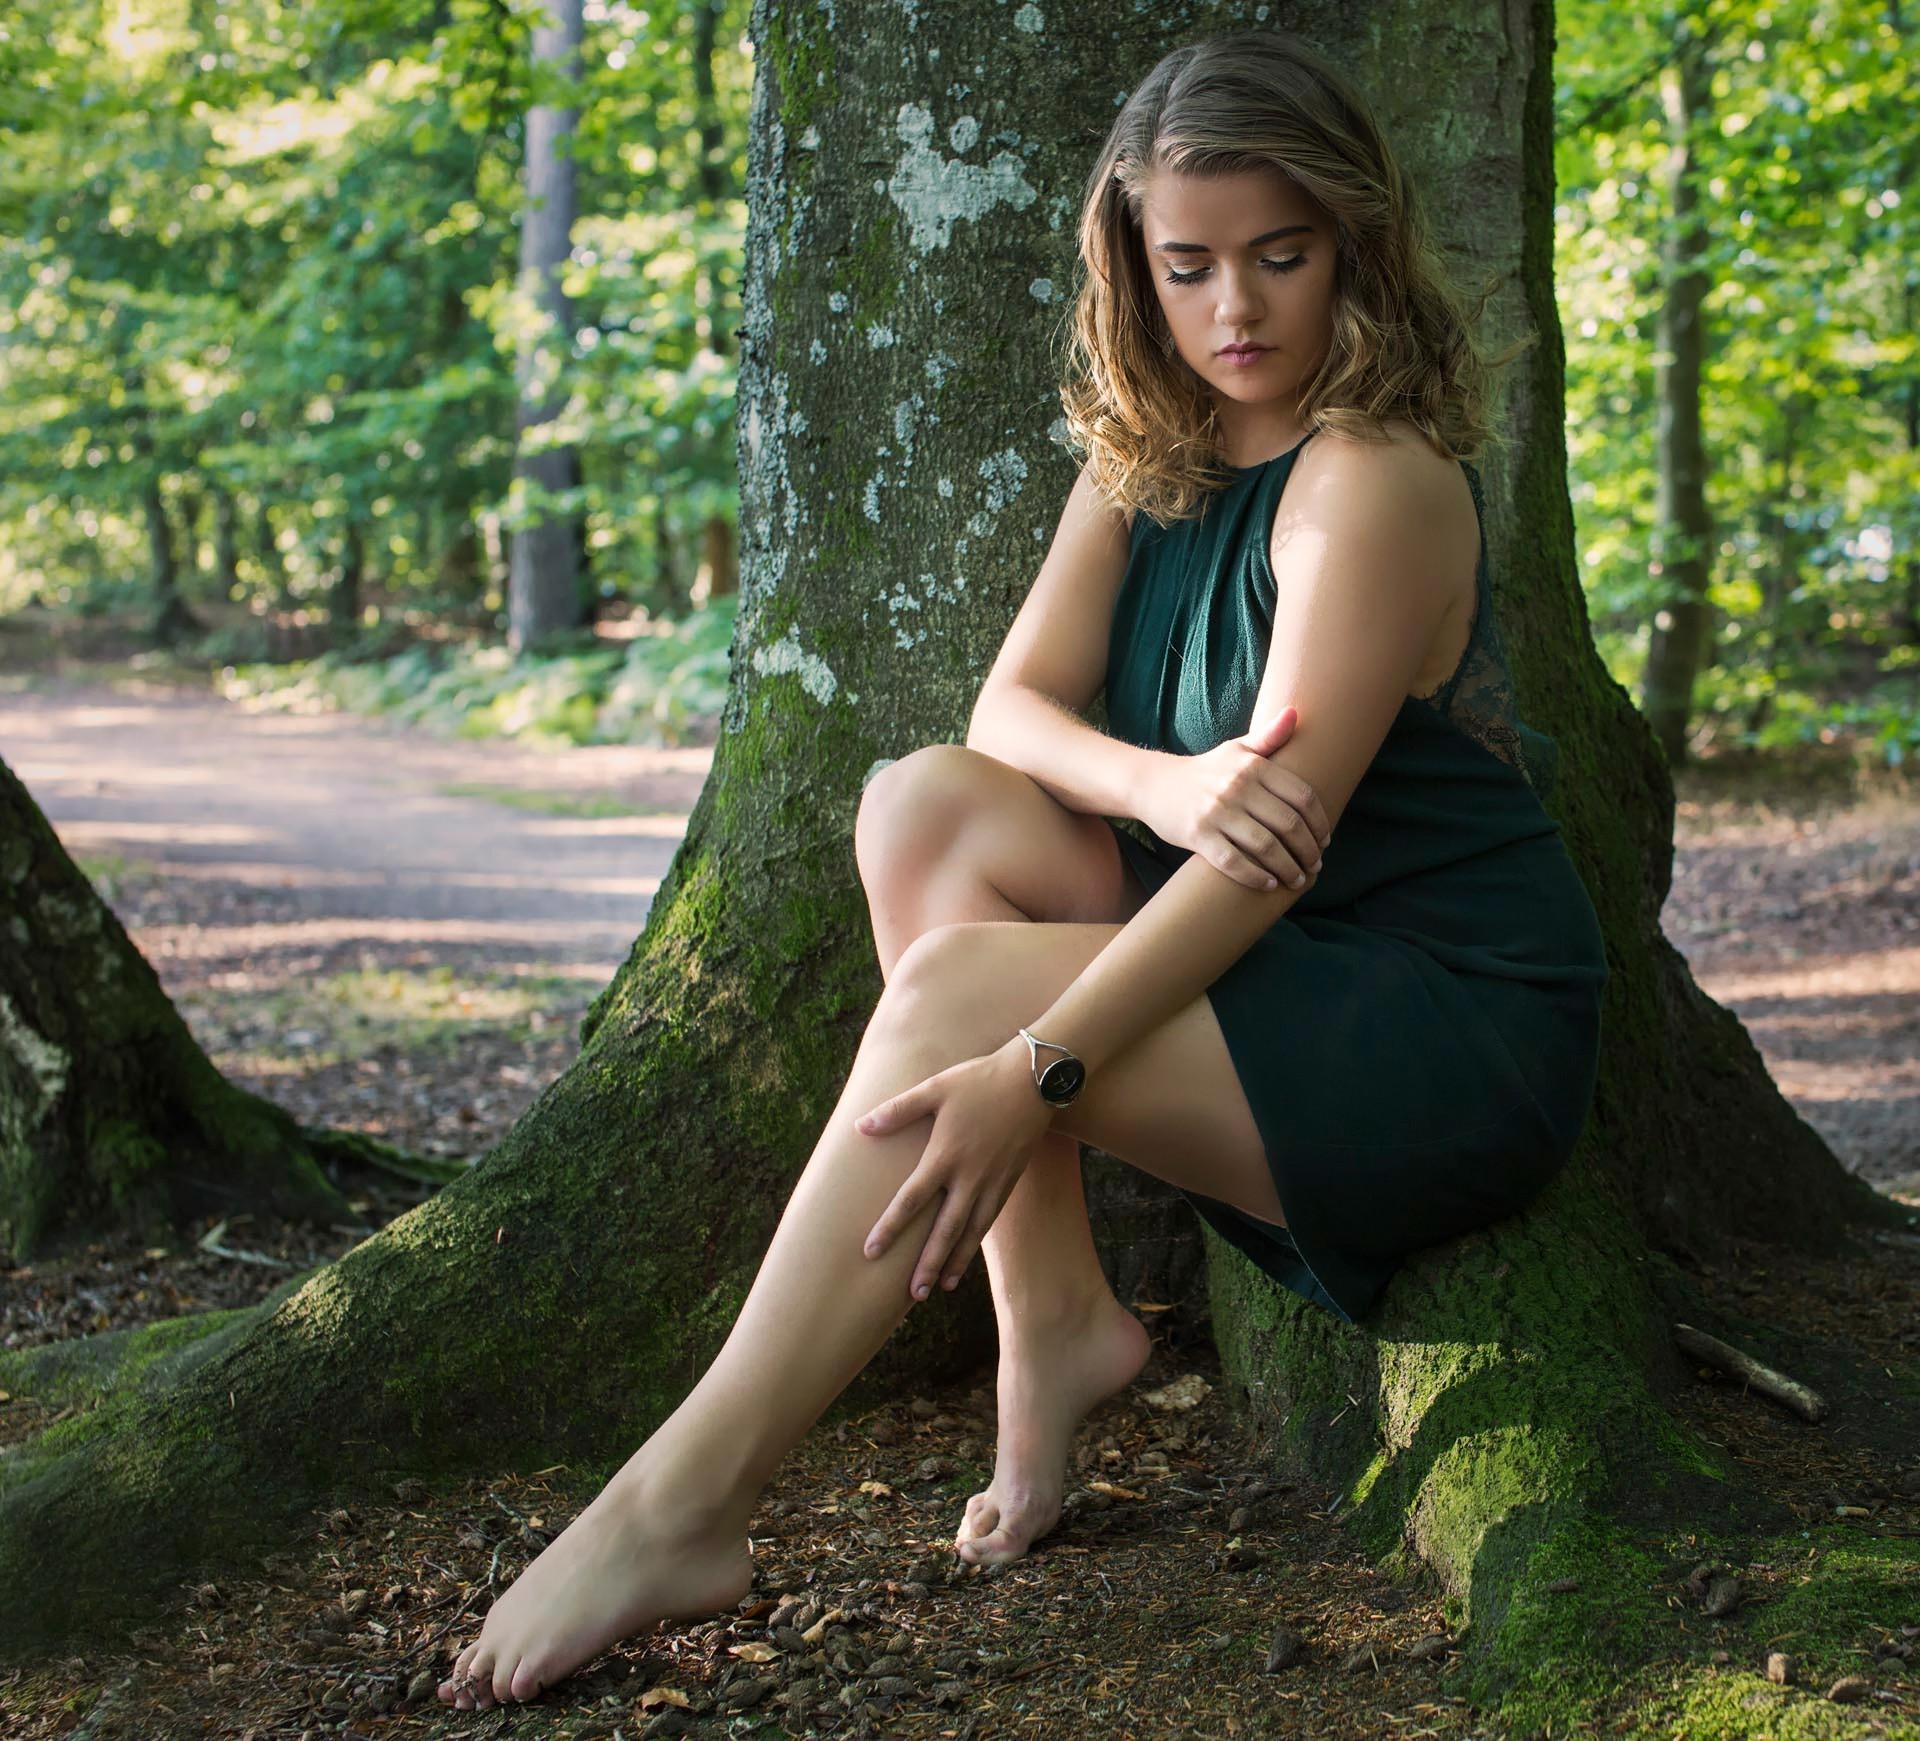 https://get.wallhere.com/photo/sunlight-forest-women-model-long-hair-barefoot-grass-sitting-photography-fashion-hair-green-dress-Person-clothing-girl-beauty-hand-lady-leg-hairstyle-footwear-habitat-human-positions-portrait-photography-photo-shoot-brown-hair-art-model-abdomen-human-body-thigh-3956.jpg